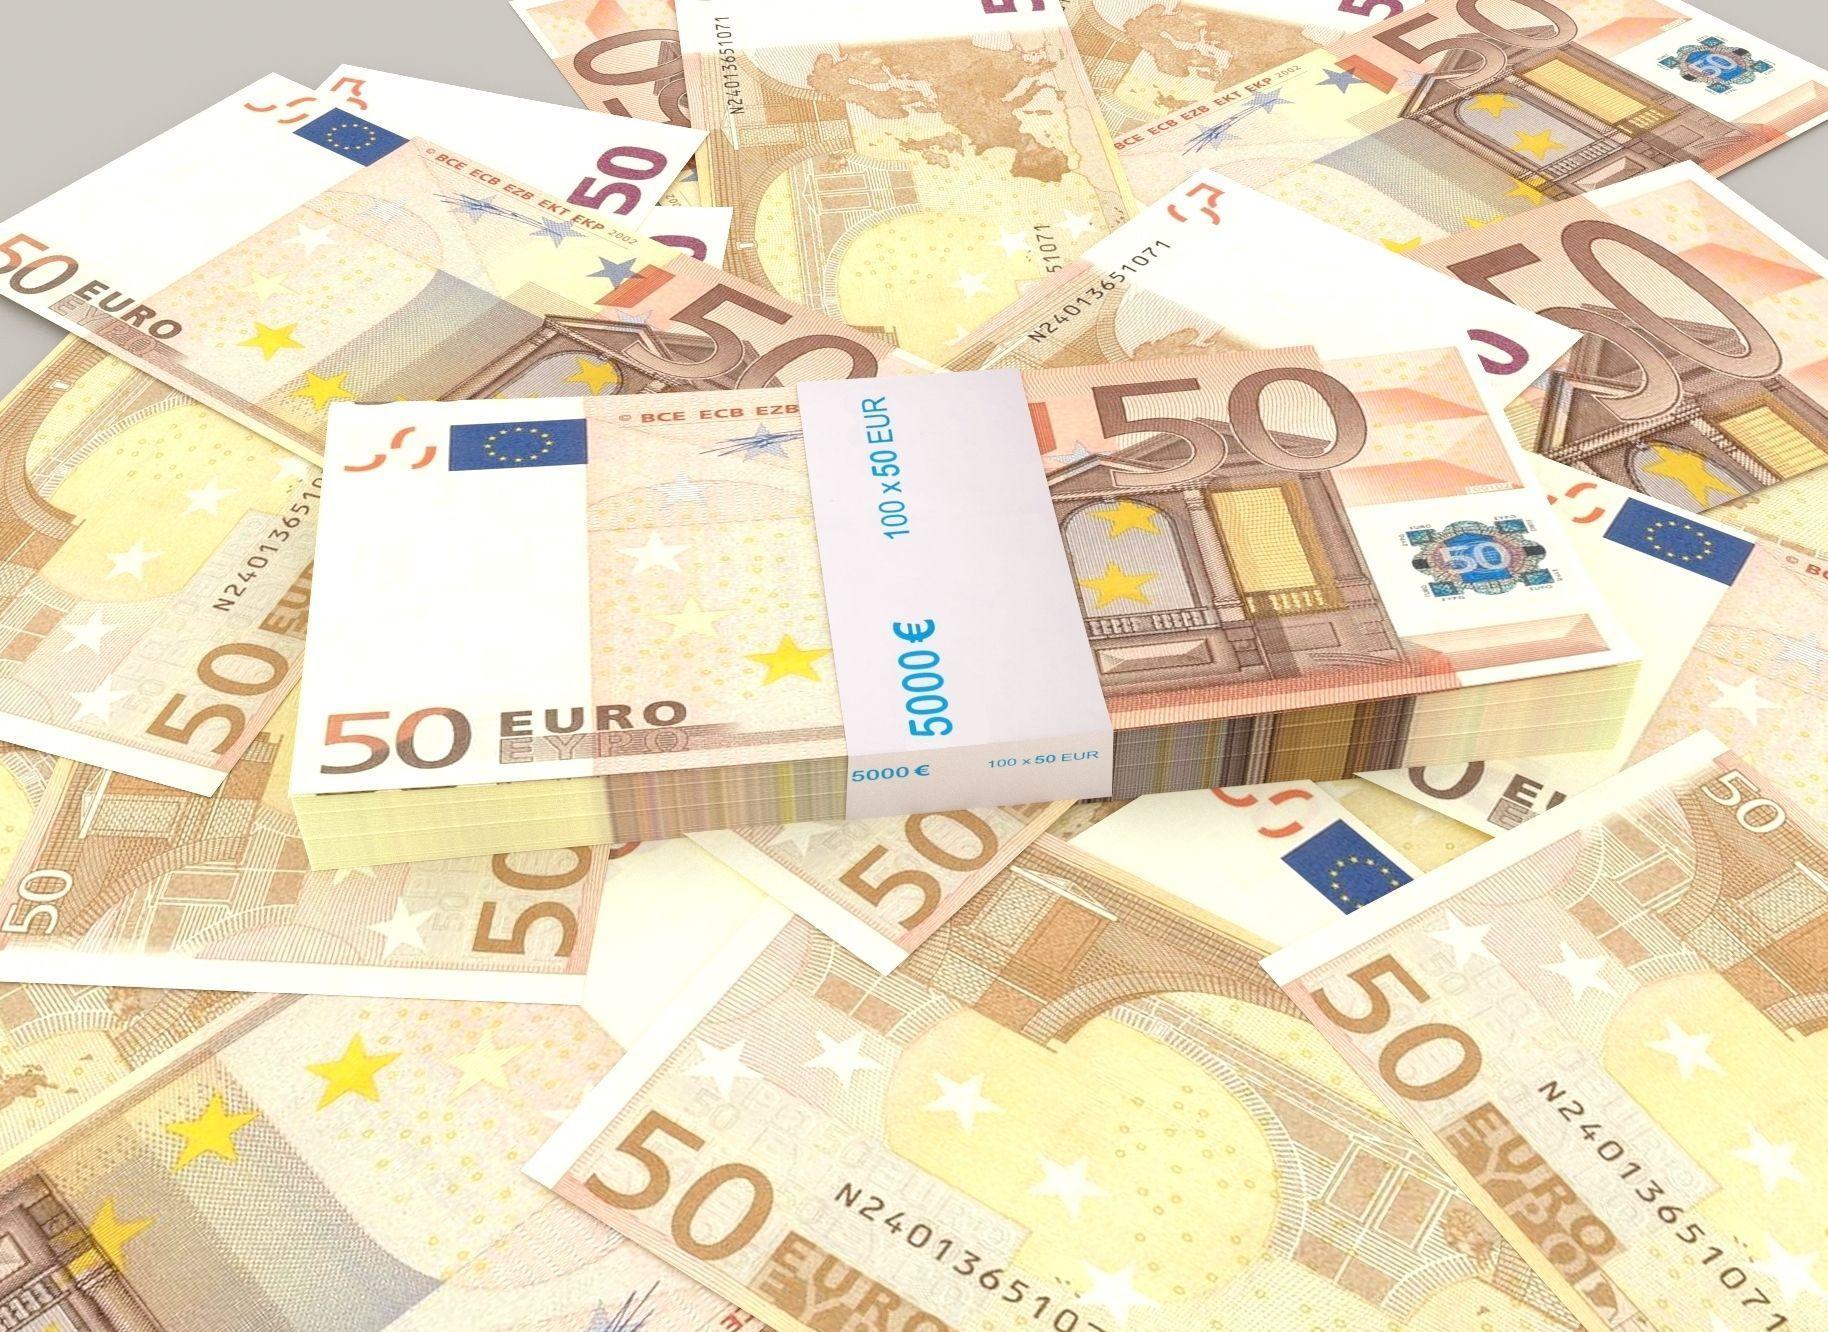 50 euro banknote packs